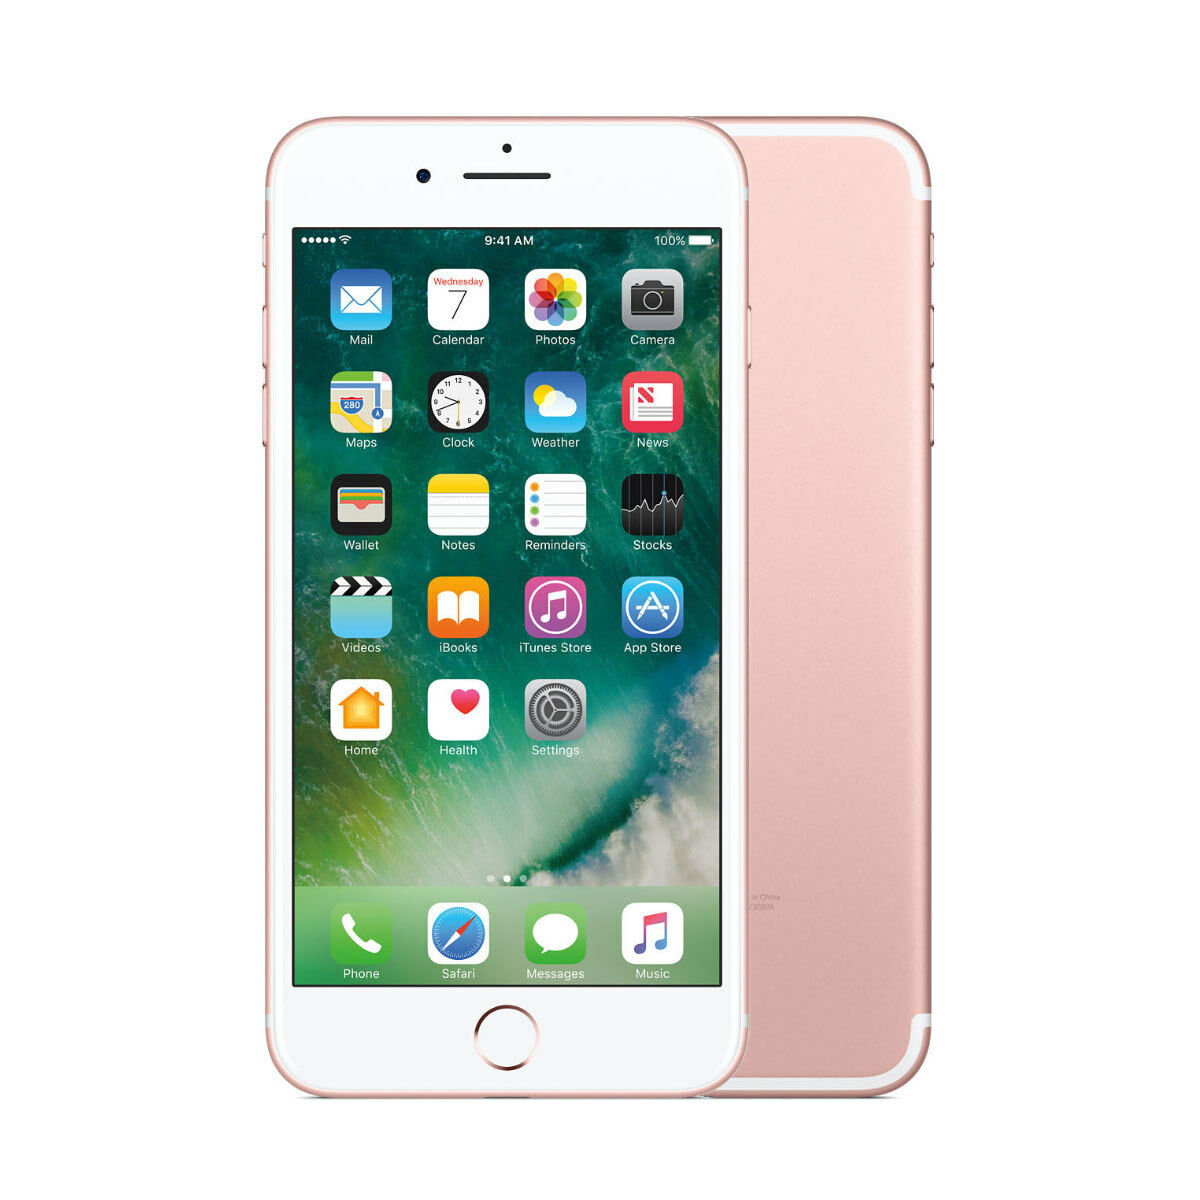 "Apple iPhone 7 128GB ""Factory Unlocked"" 4G LTE iOS WiFi Smartphone"